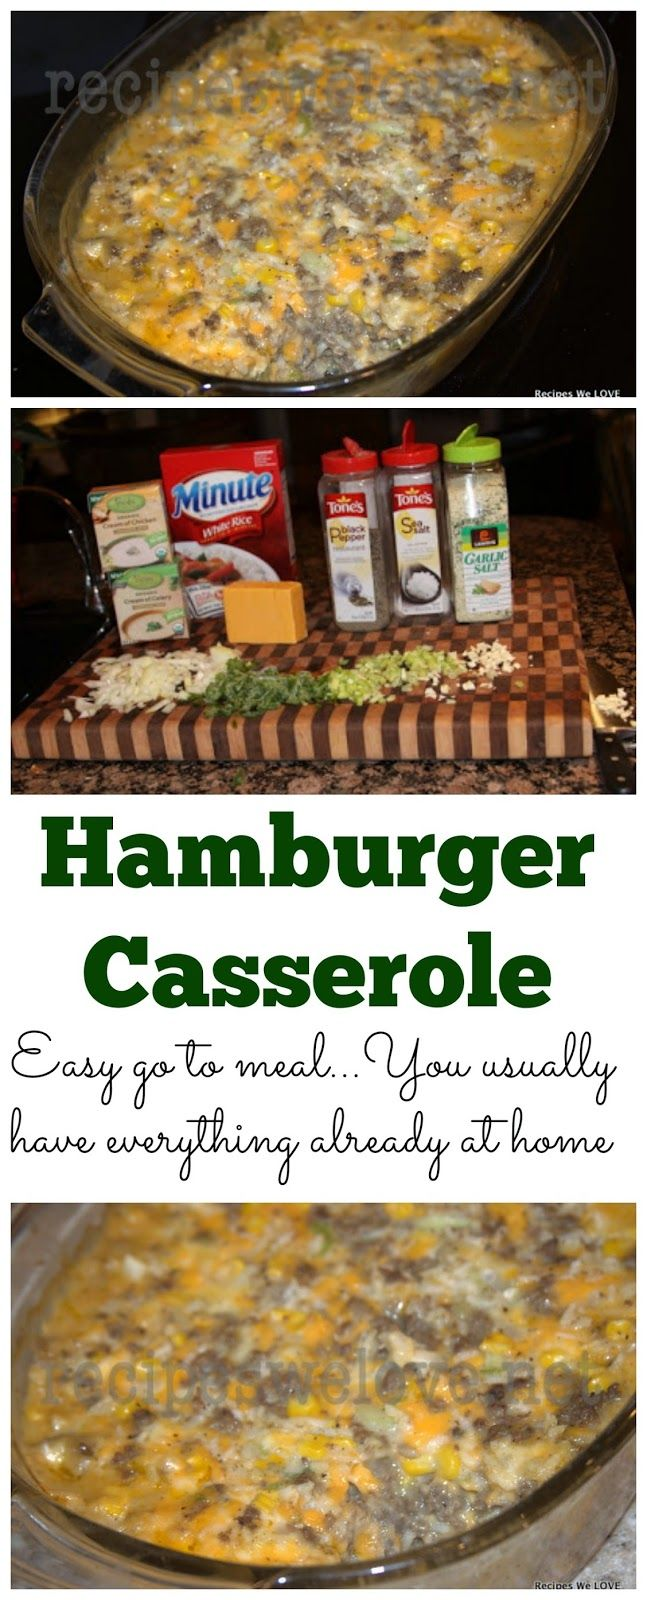 Recipes We Love: Hamburger Casserole